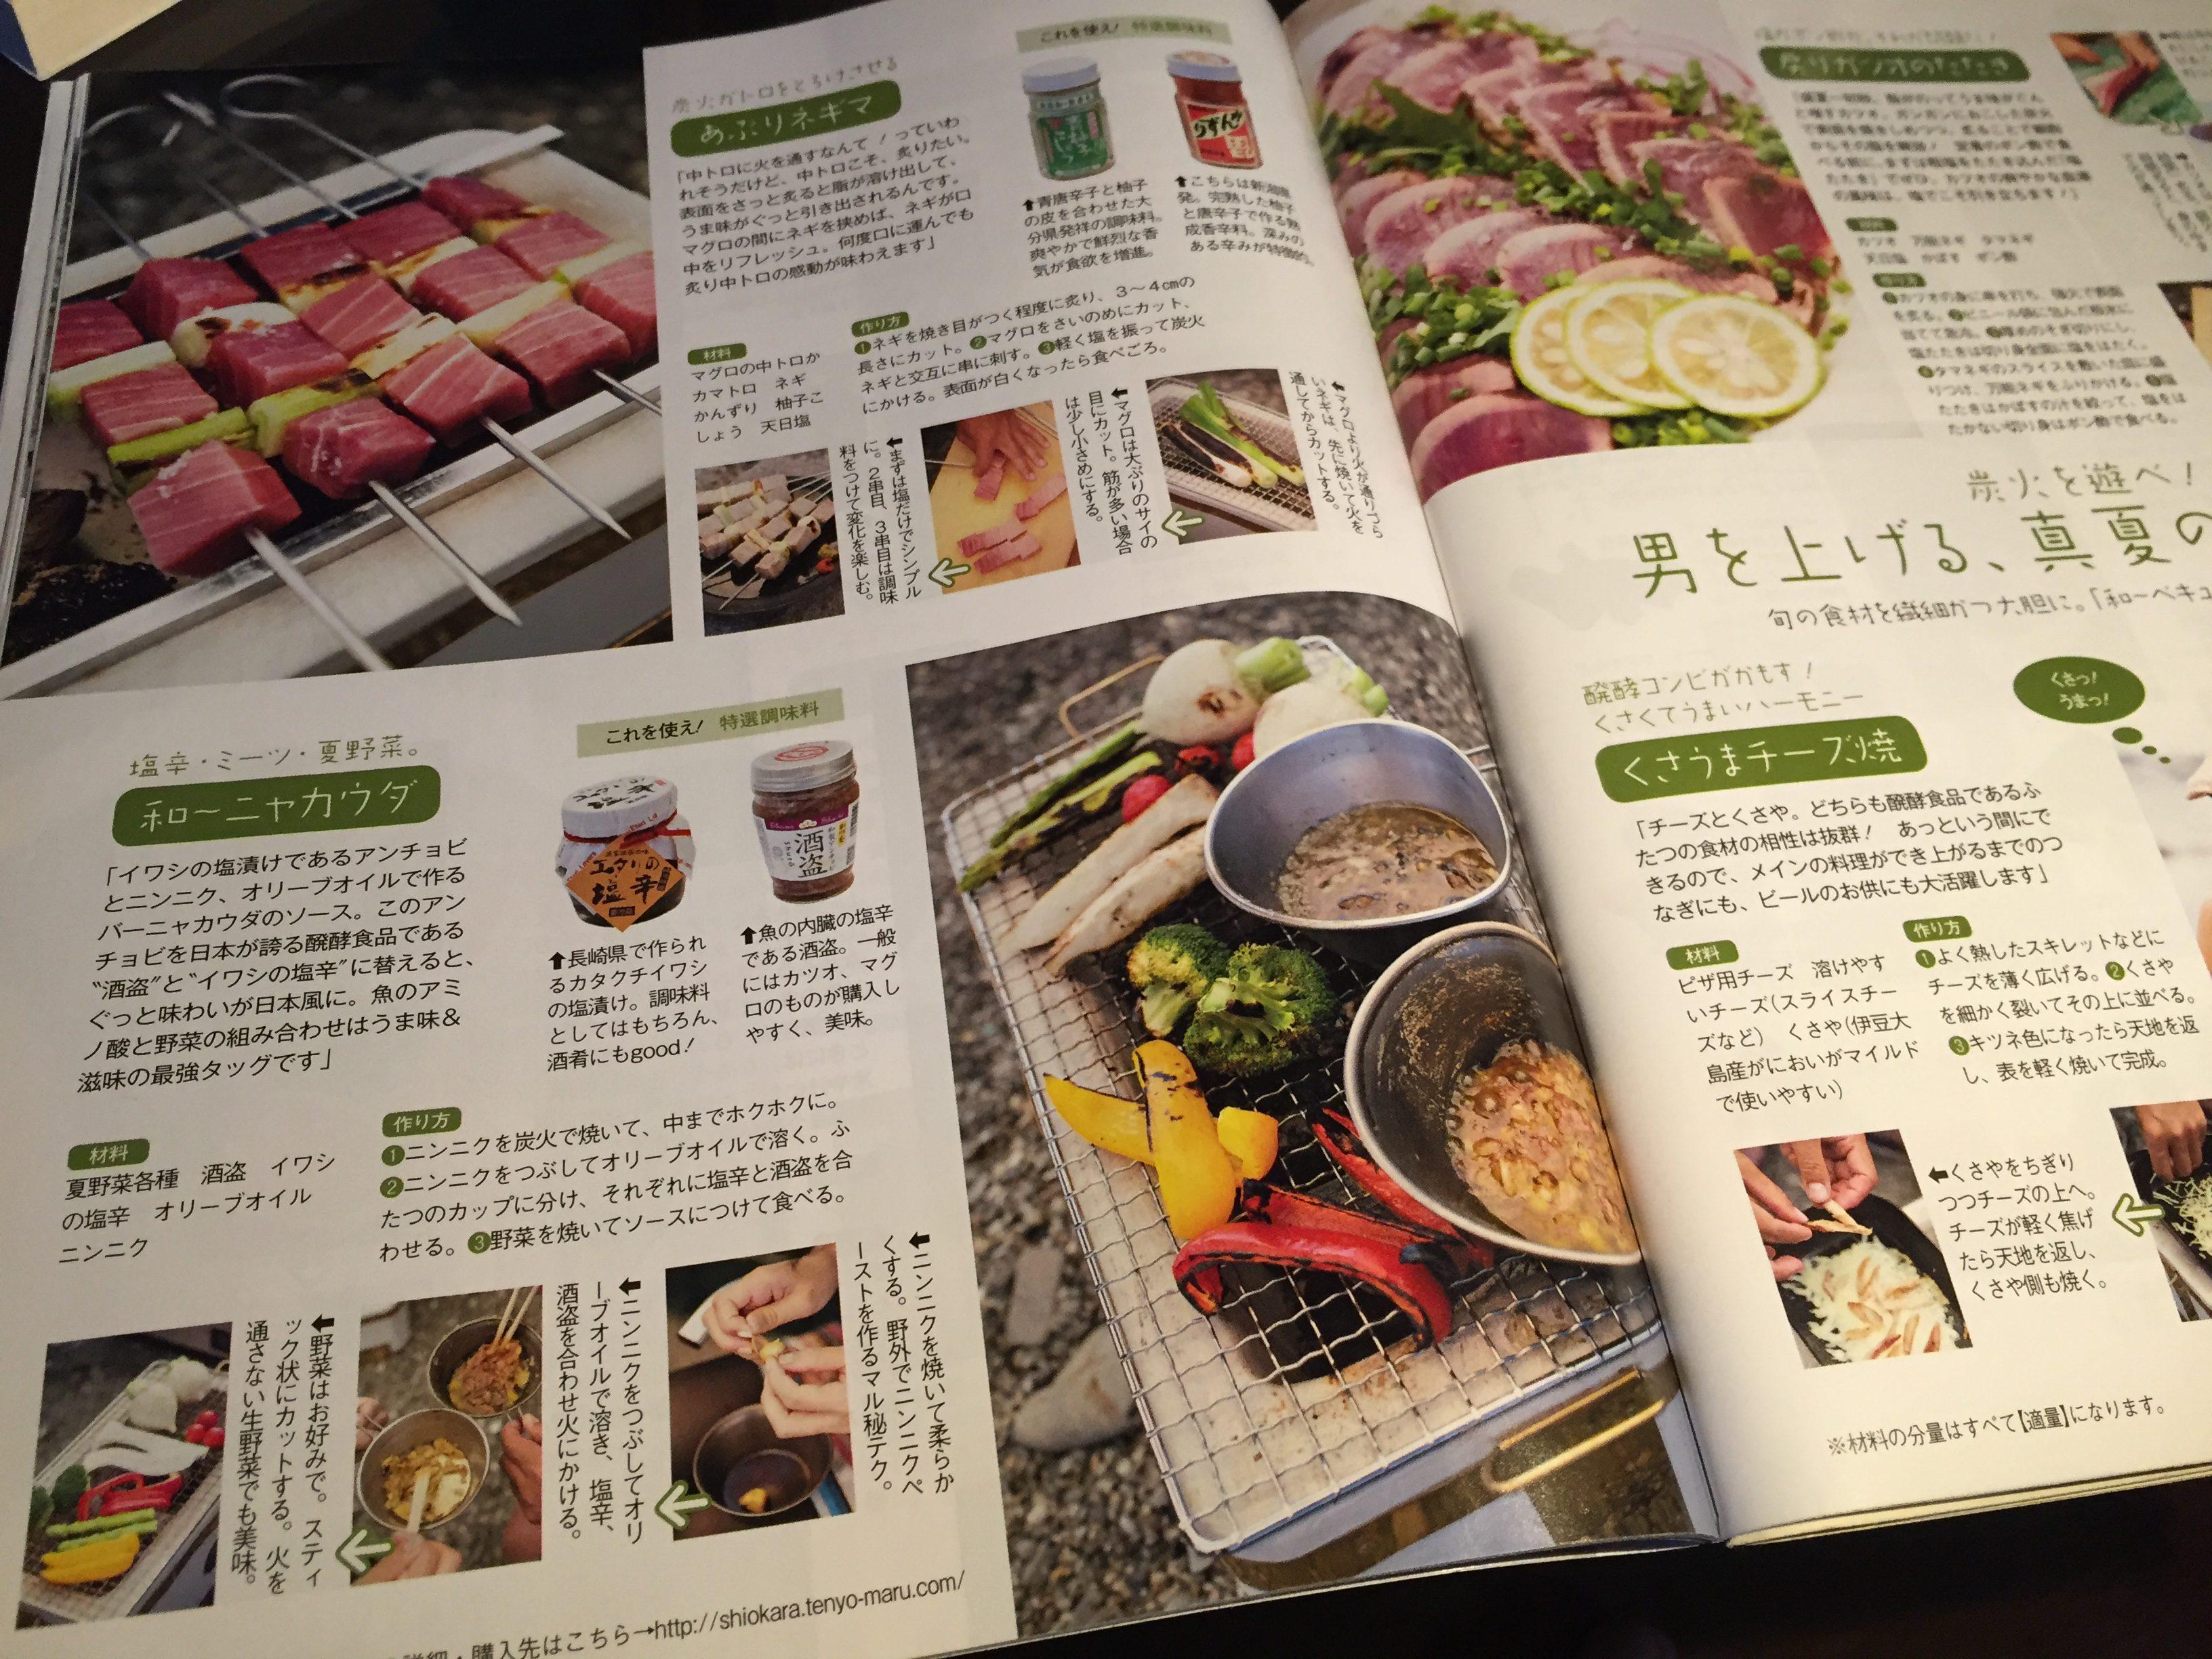 BE-PAL 七輪料理特集記事 和~べキュー